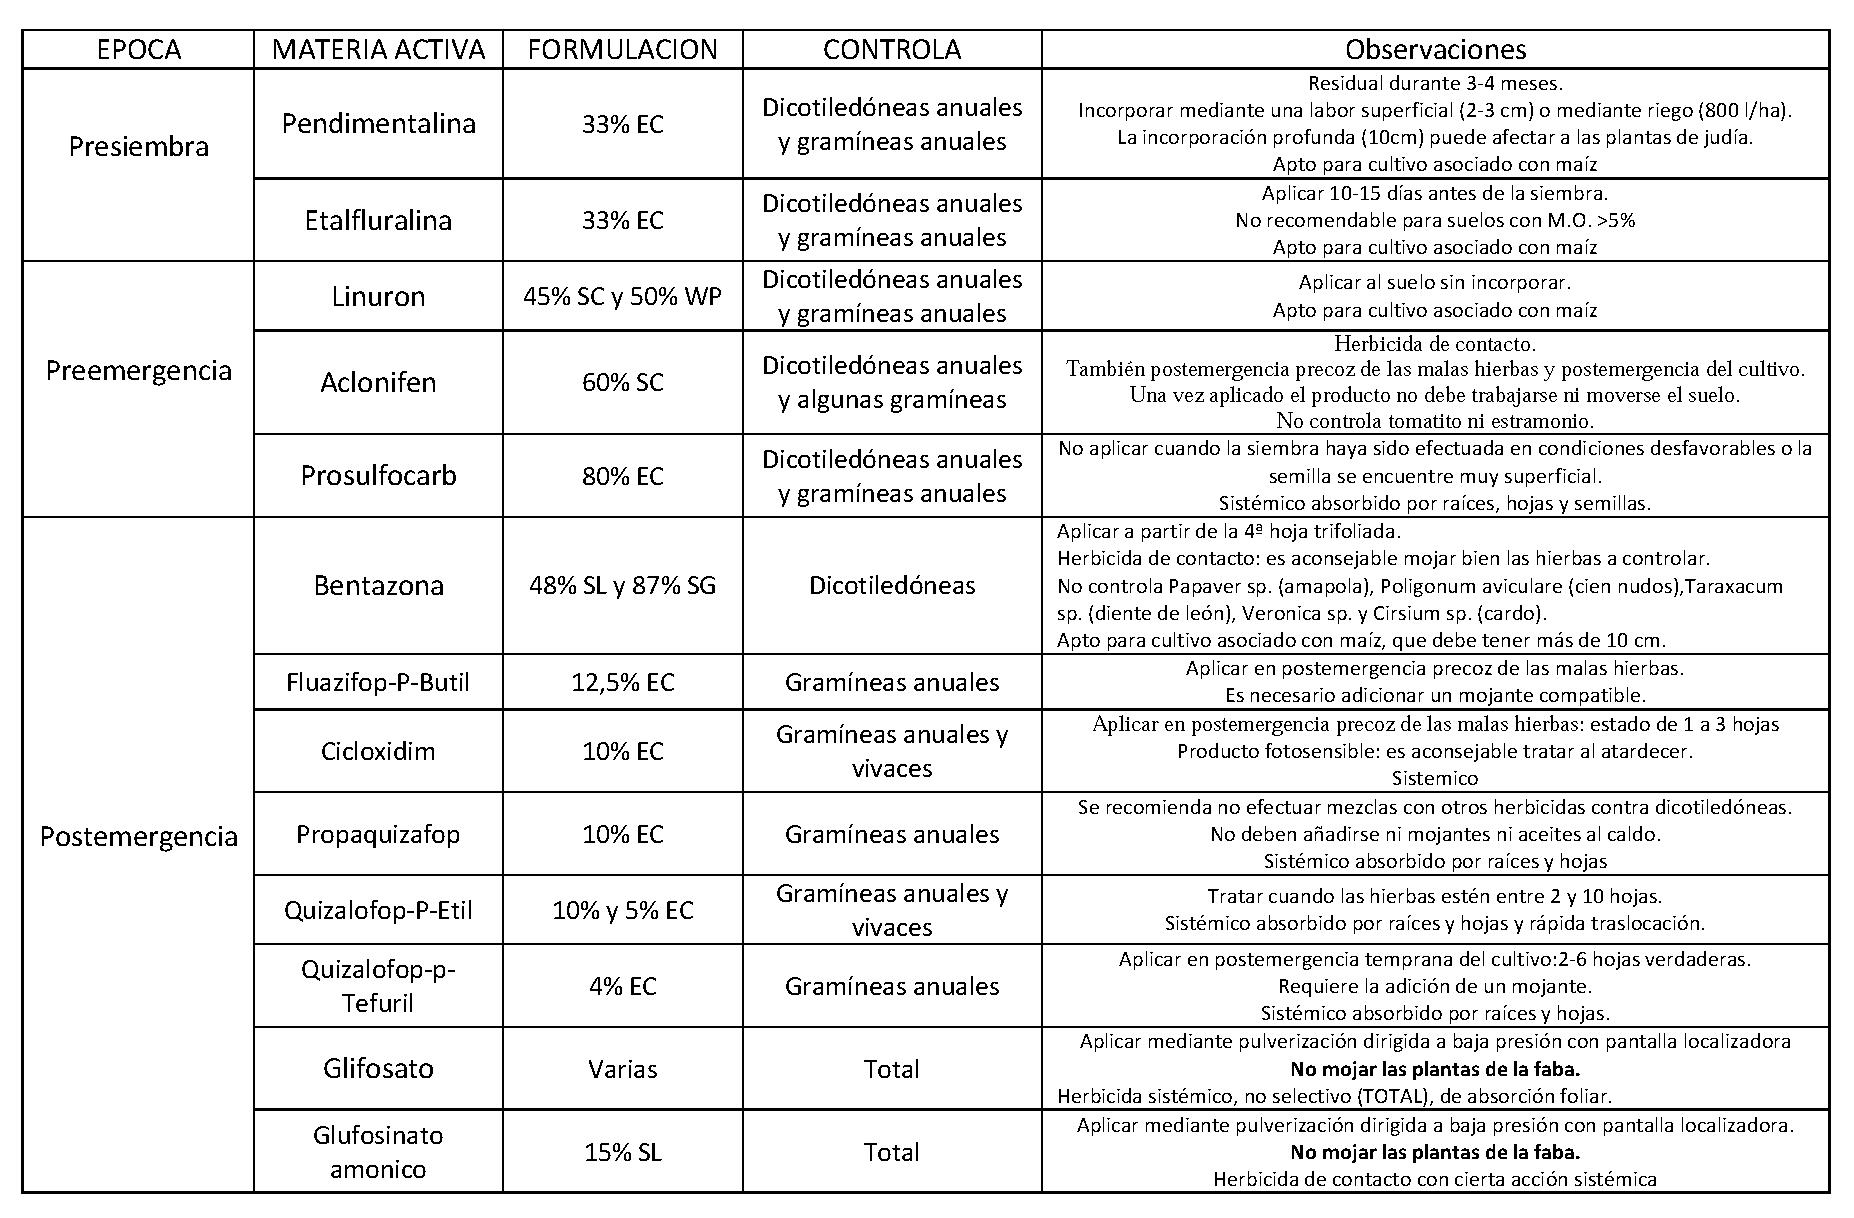 lista de productos fitosanitarios: